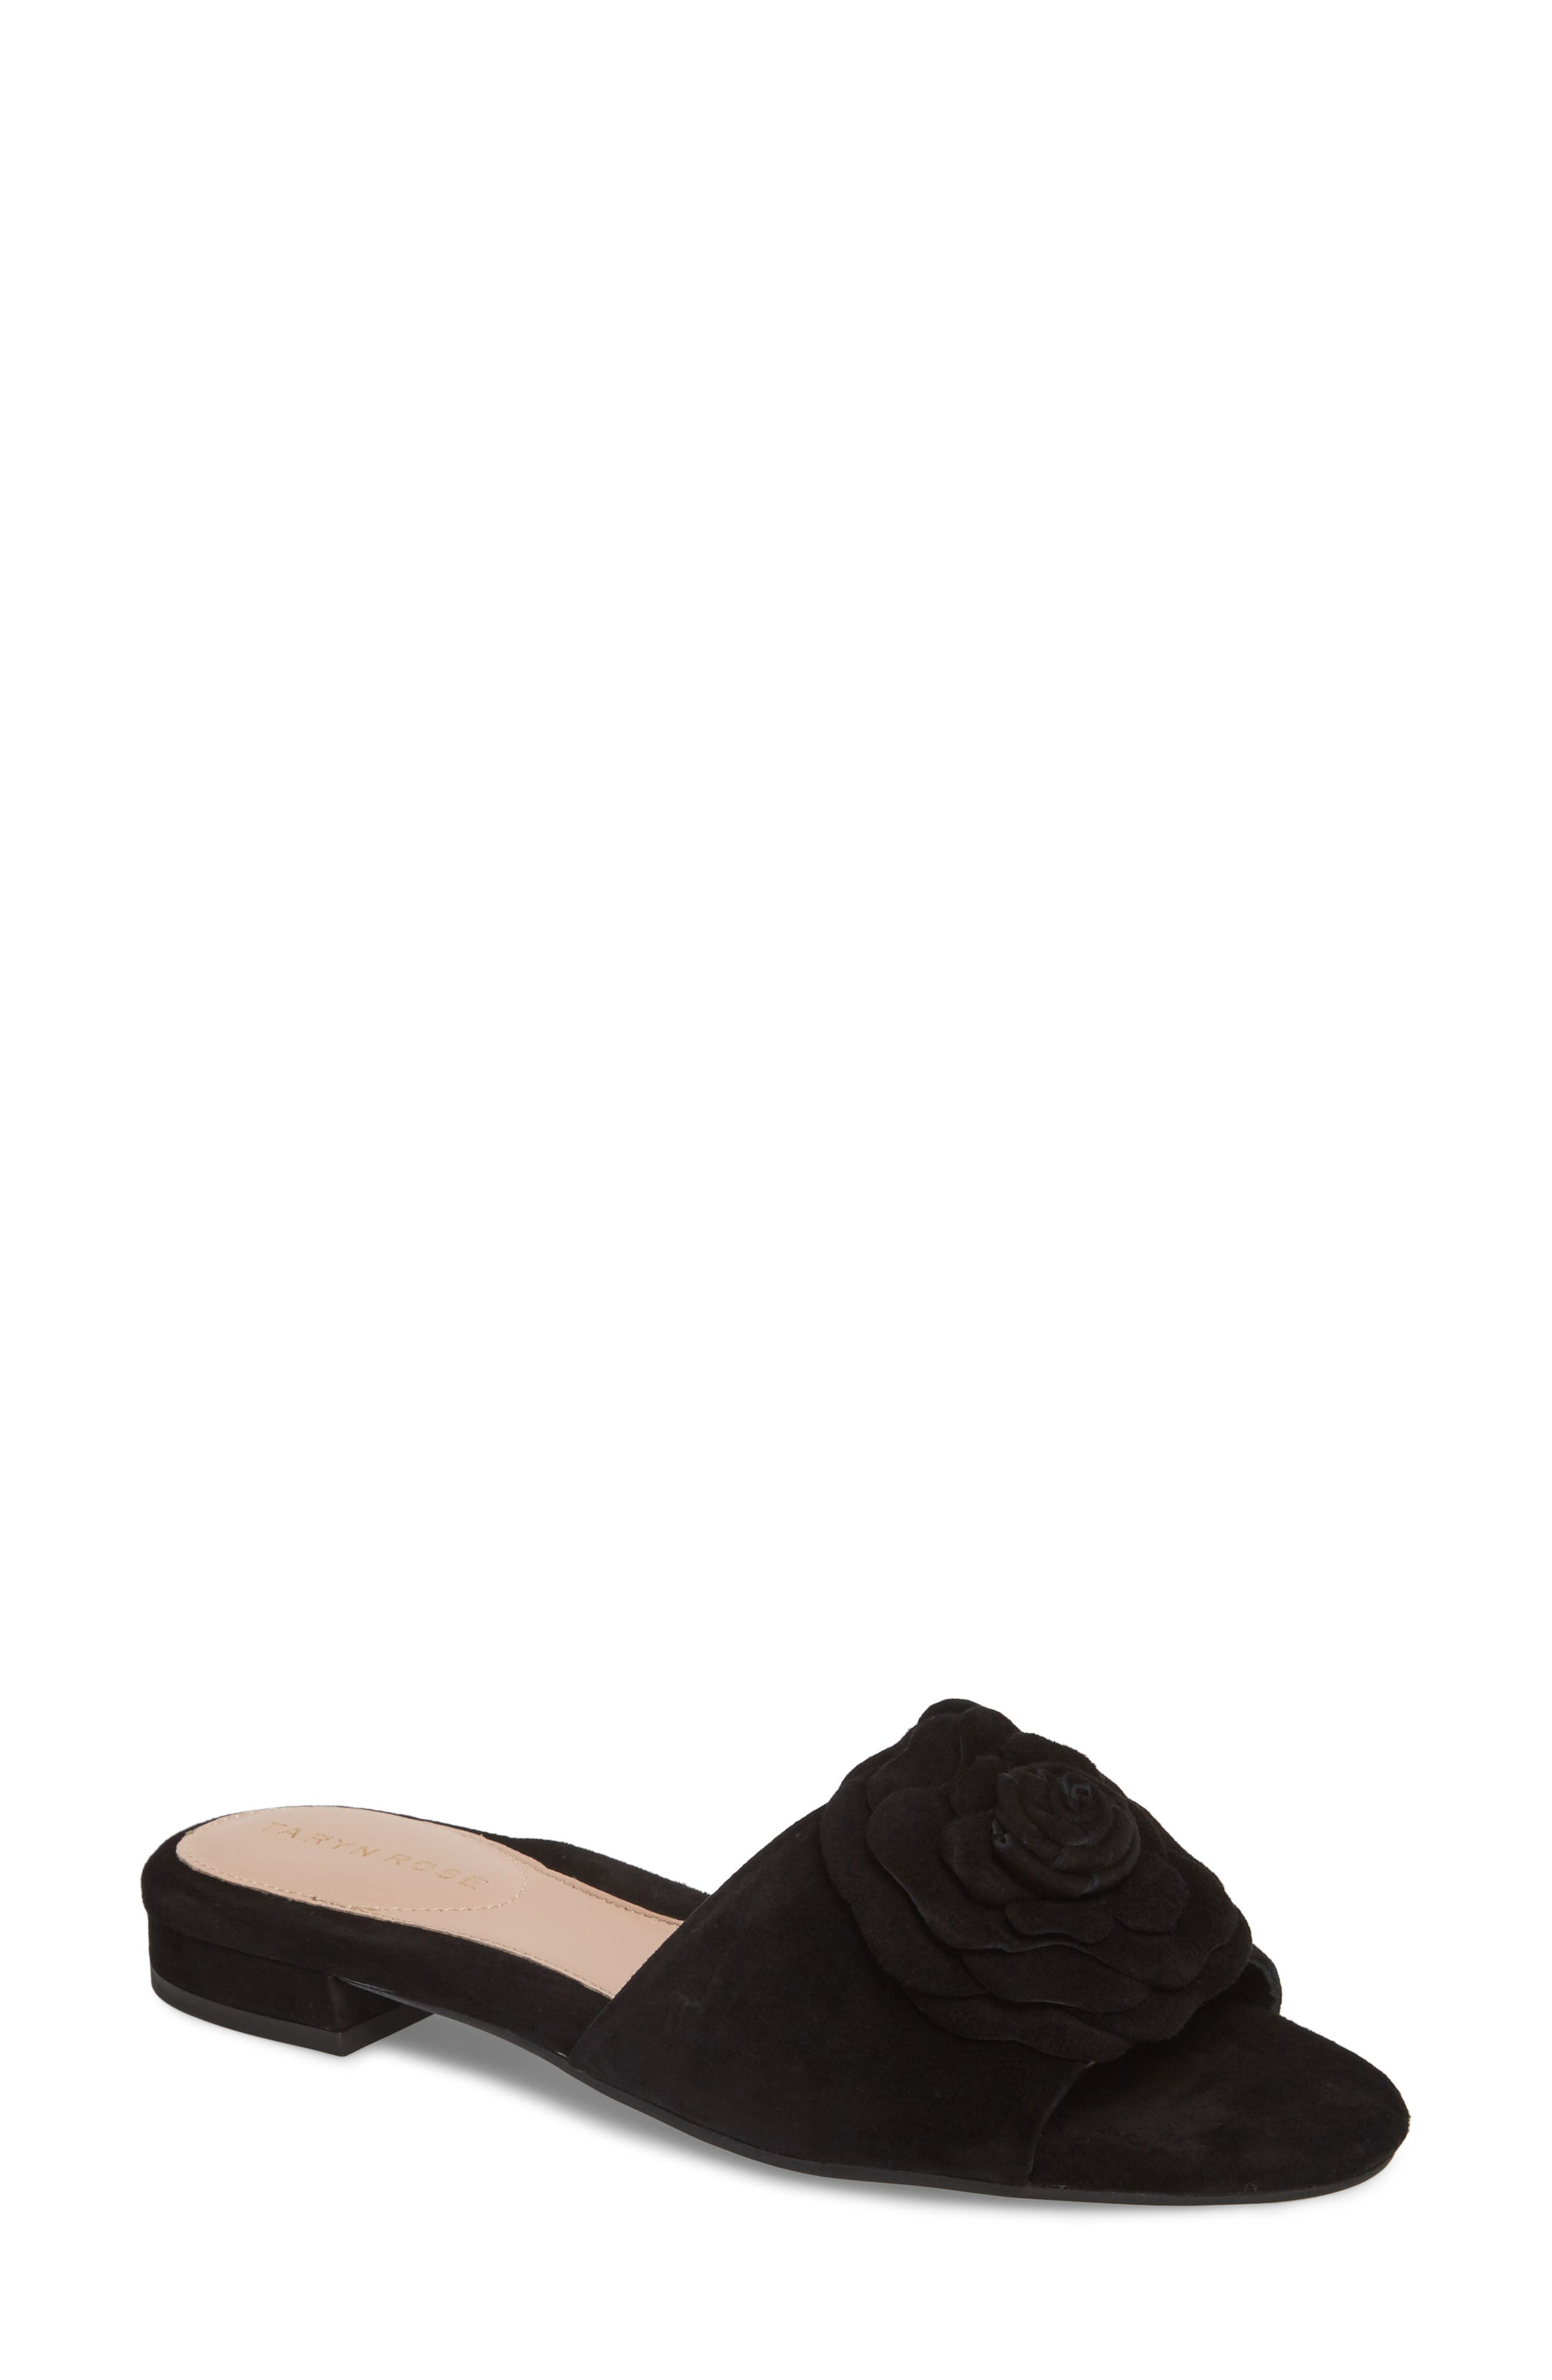 Taryn Rose Violet Flower Slide Sandal, Black